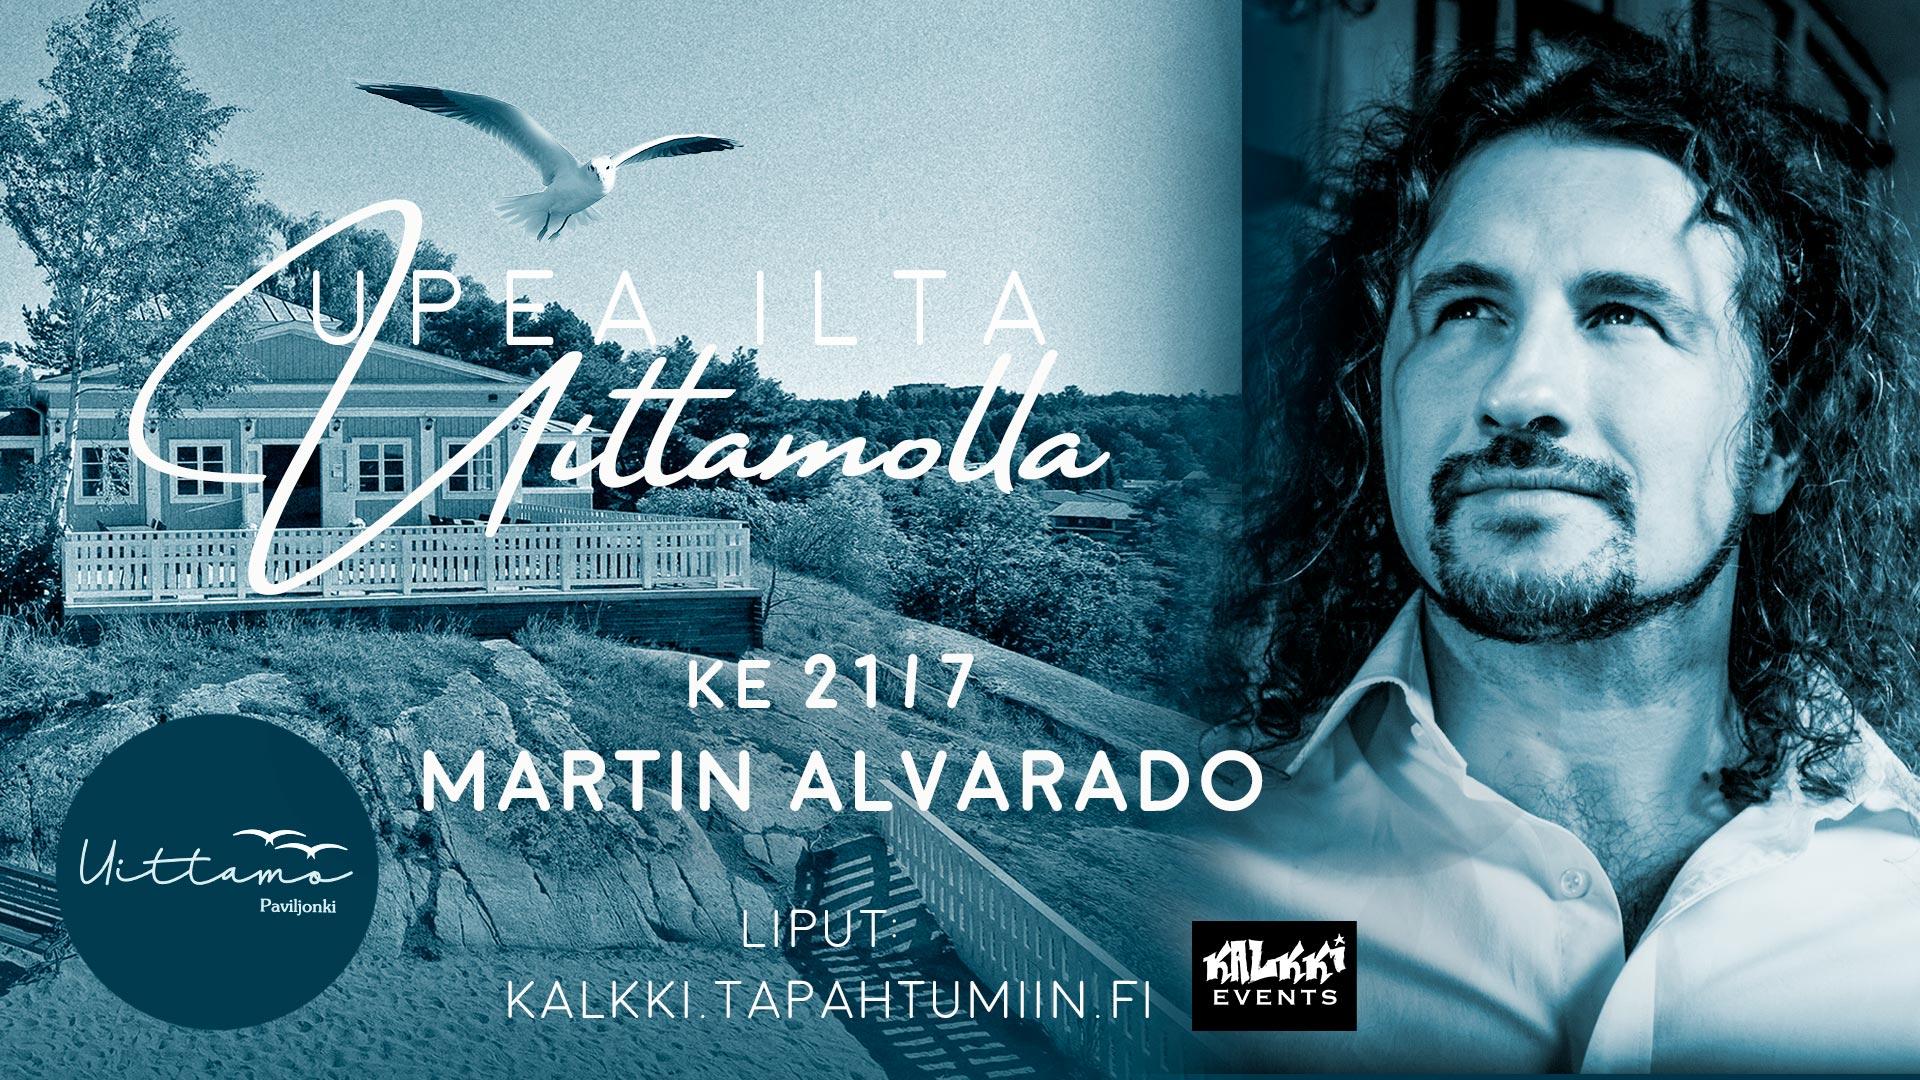 Upea ilta Uittamolla: Martin Alvarado